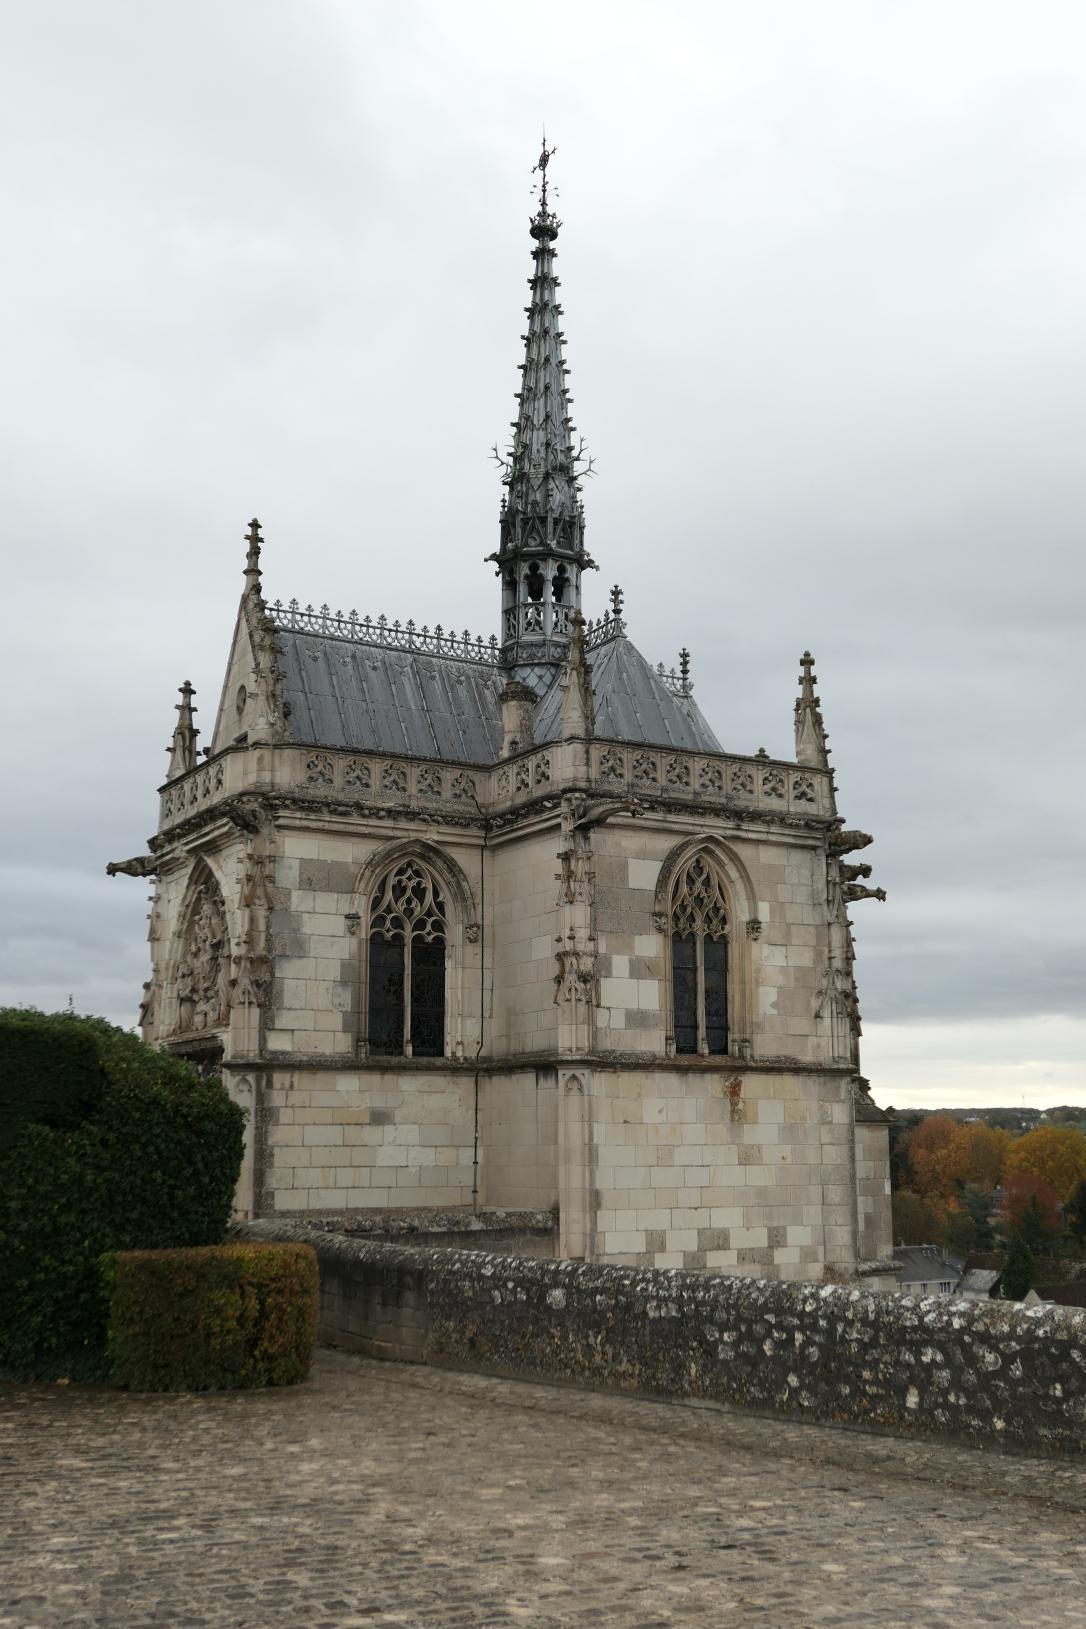 Chateau d'Amboise Chapel of Saint-Hubert Burial Site of Leonardo da Vinci